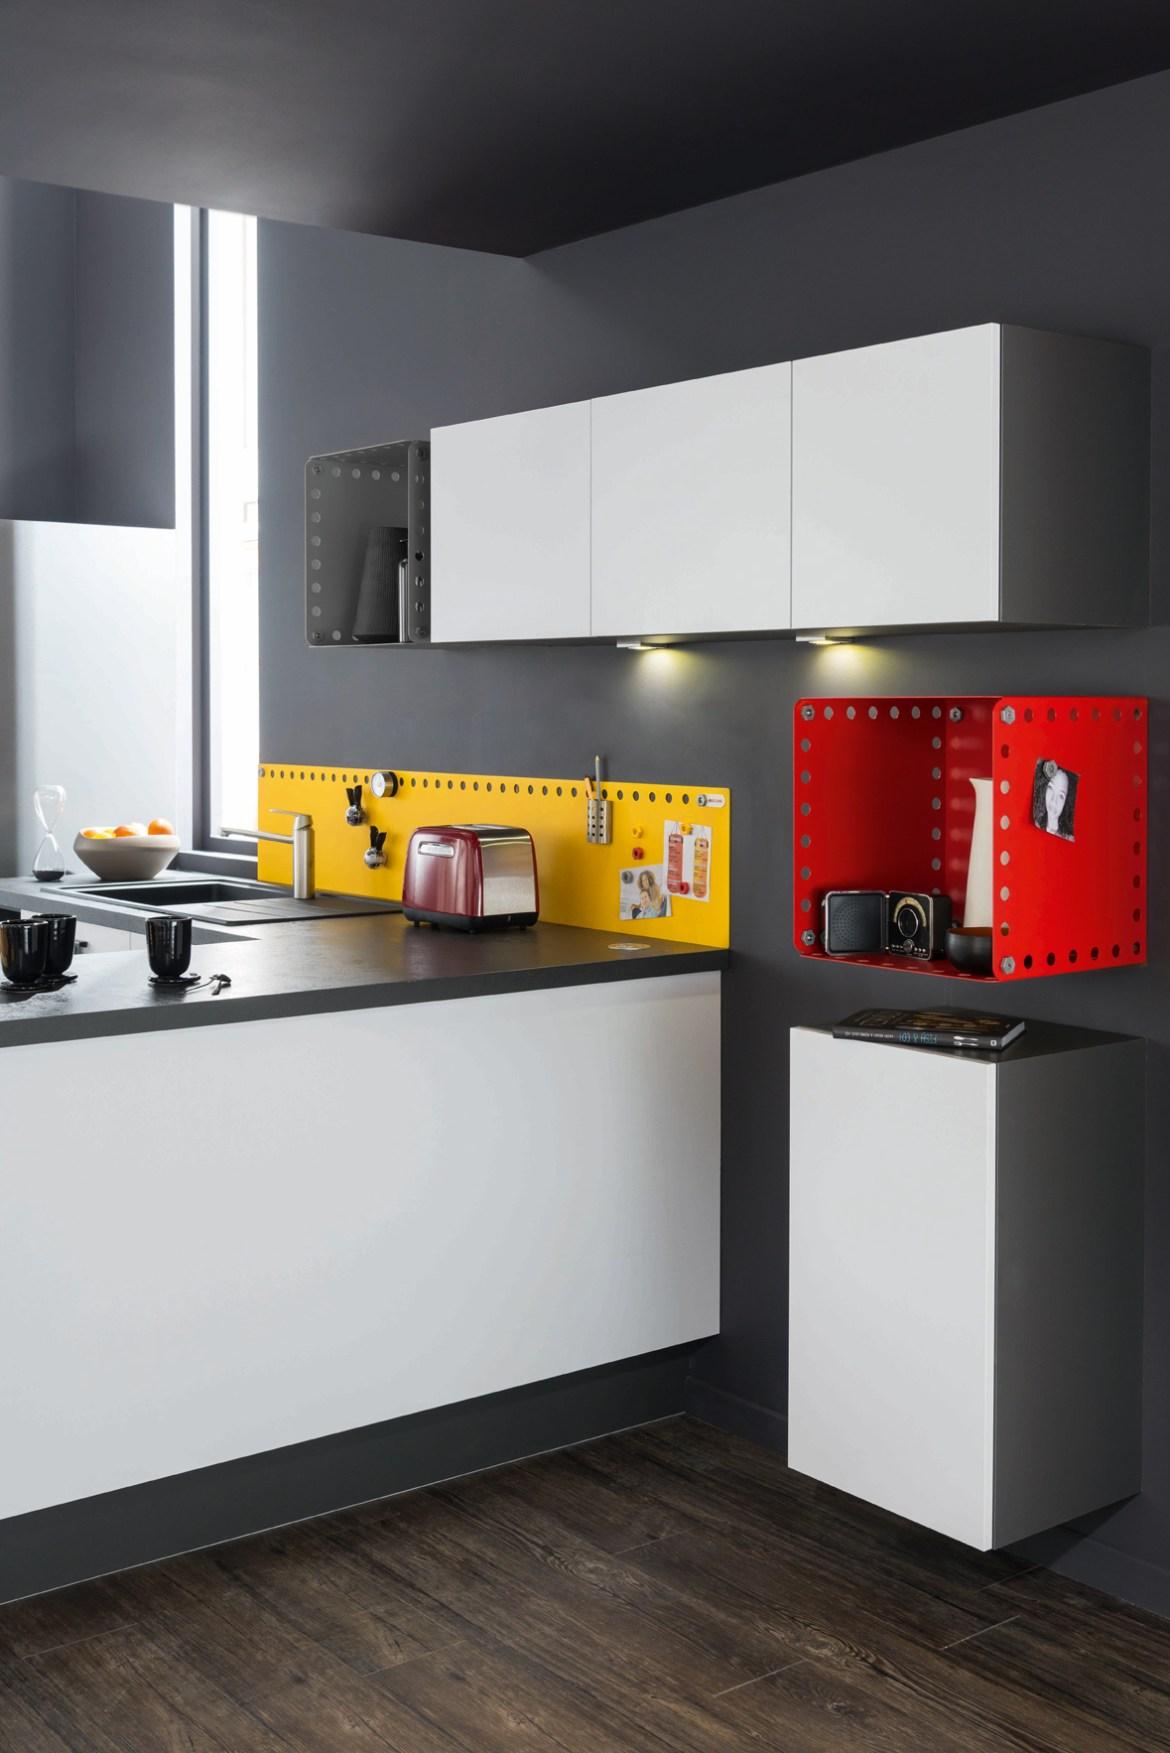 socoo 39 c une cuisine tellement ludik cuisines et bains. Black Bedroom Furniture Sets. Home Design Ideas